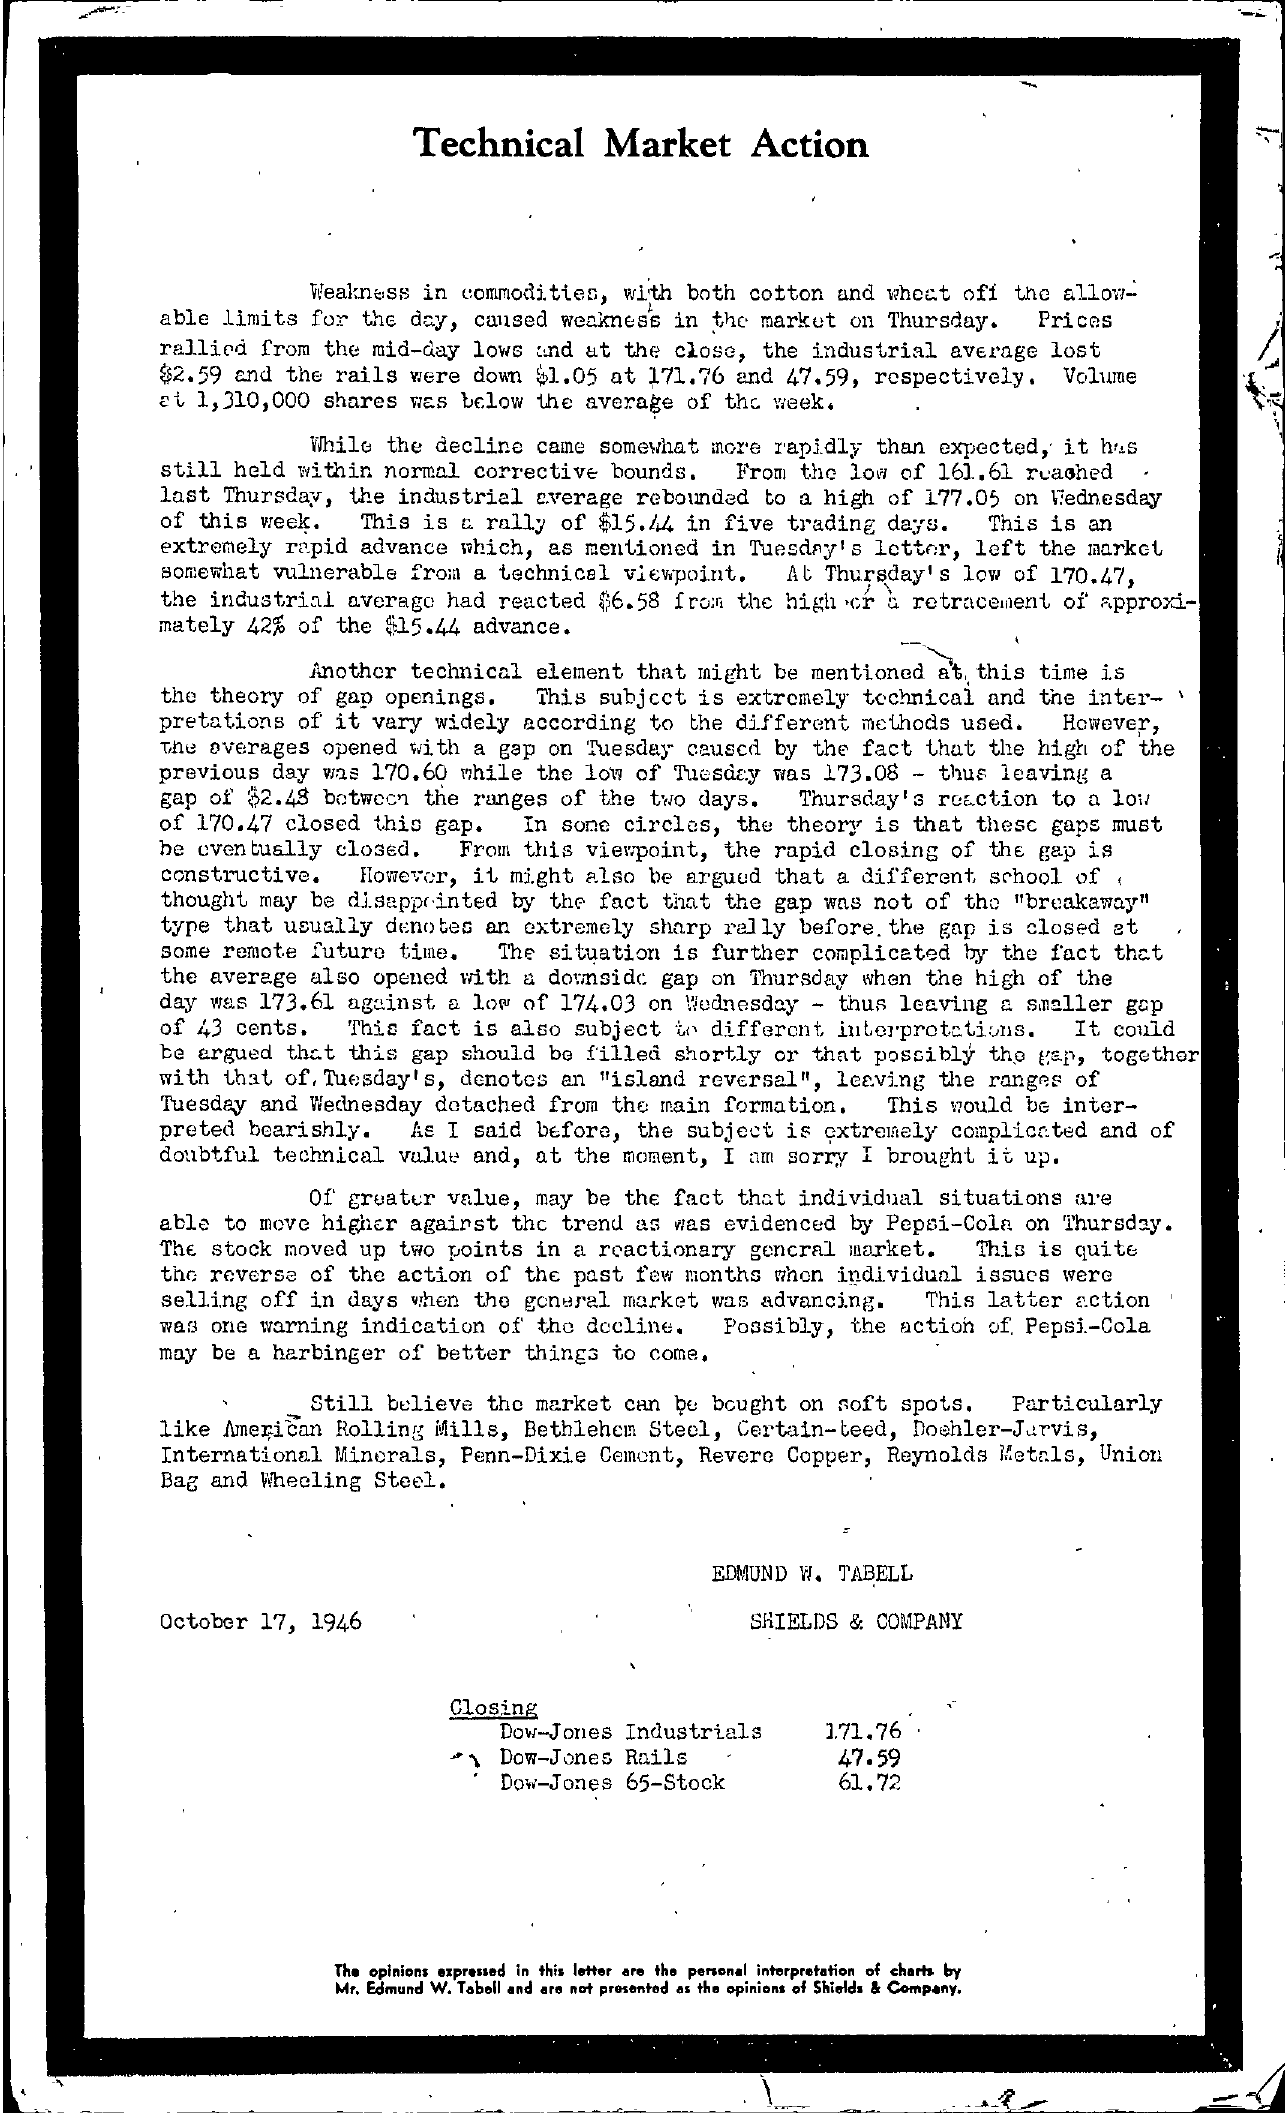 Tabell's Market Letter - October 17, 1946